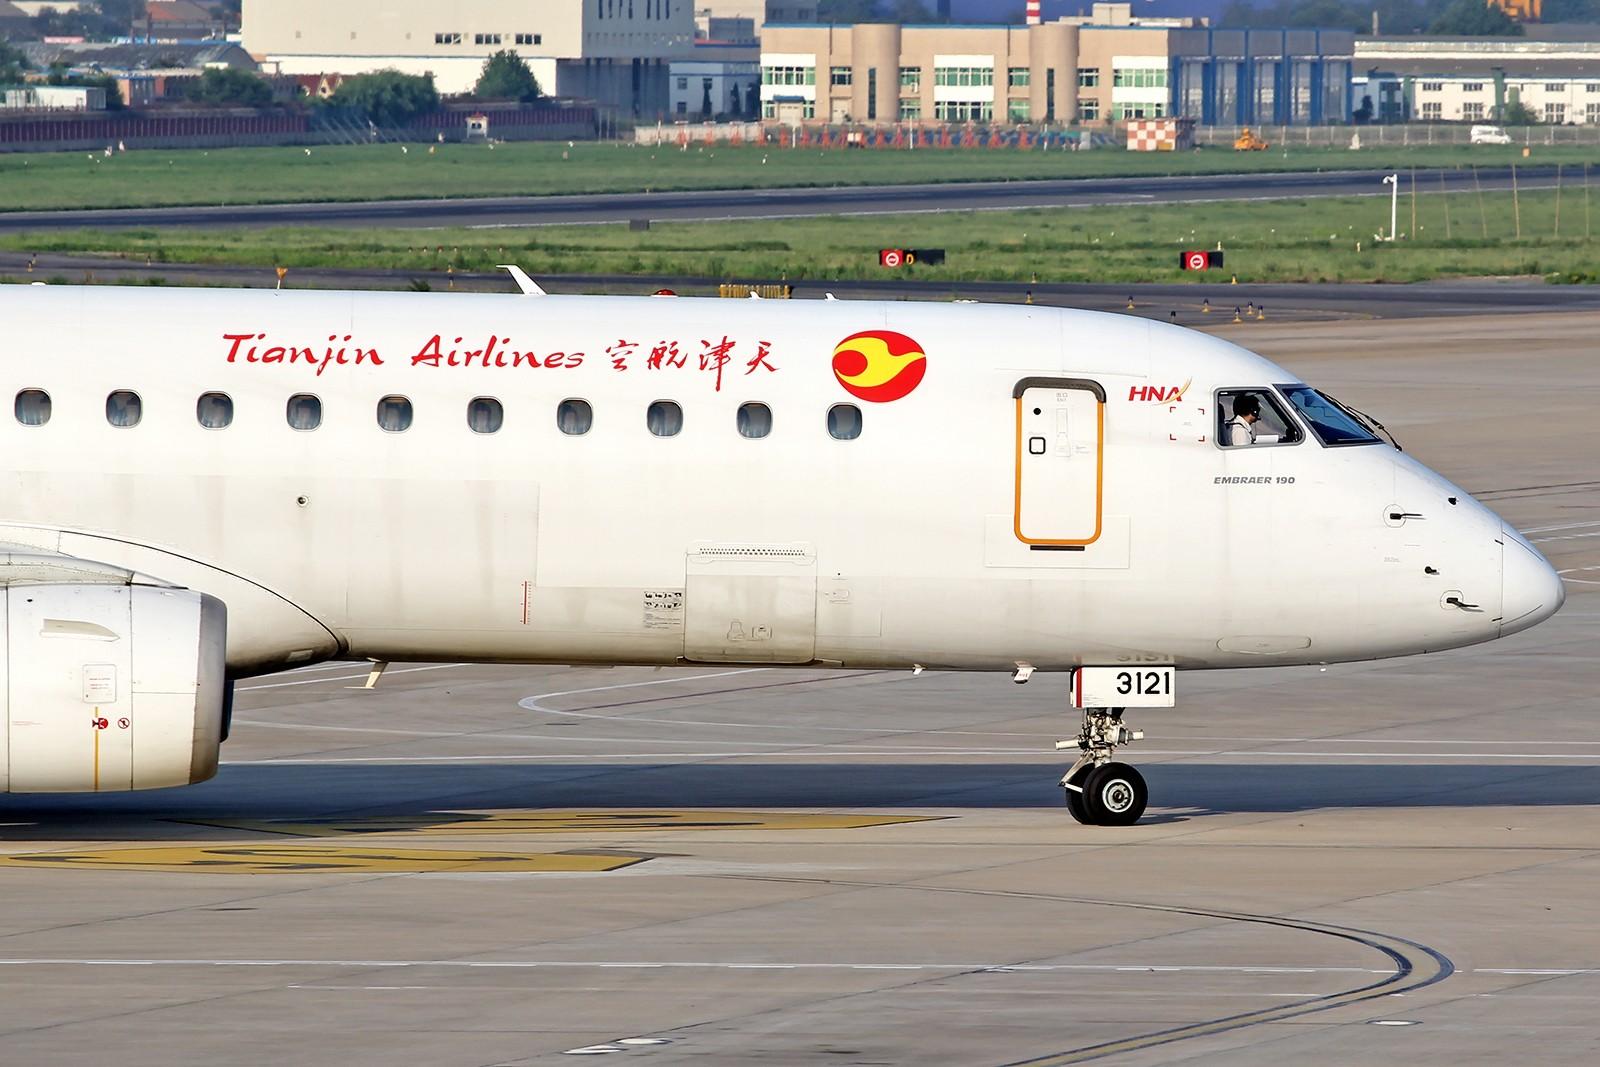 Re:[原创][DLC]。。。夕阳西下。。。 EMBRAER E-190 B-3121 中国大连周水子国际机场